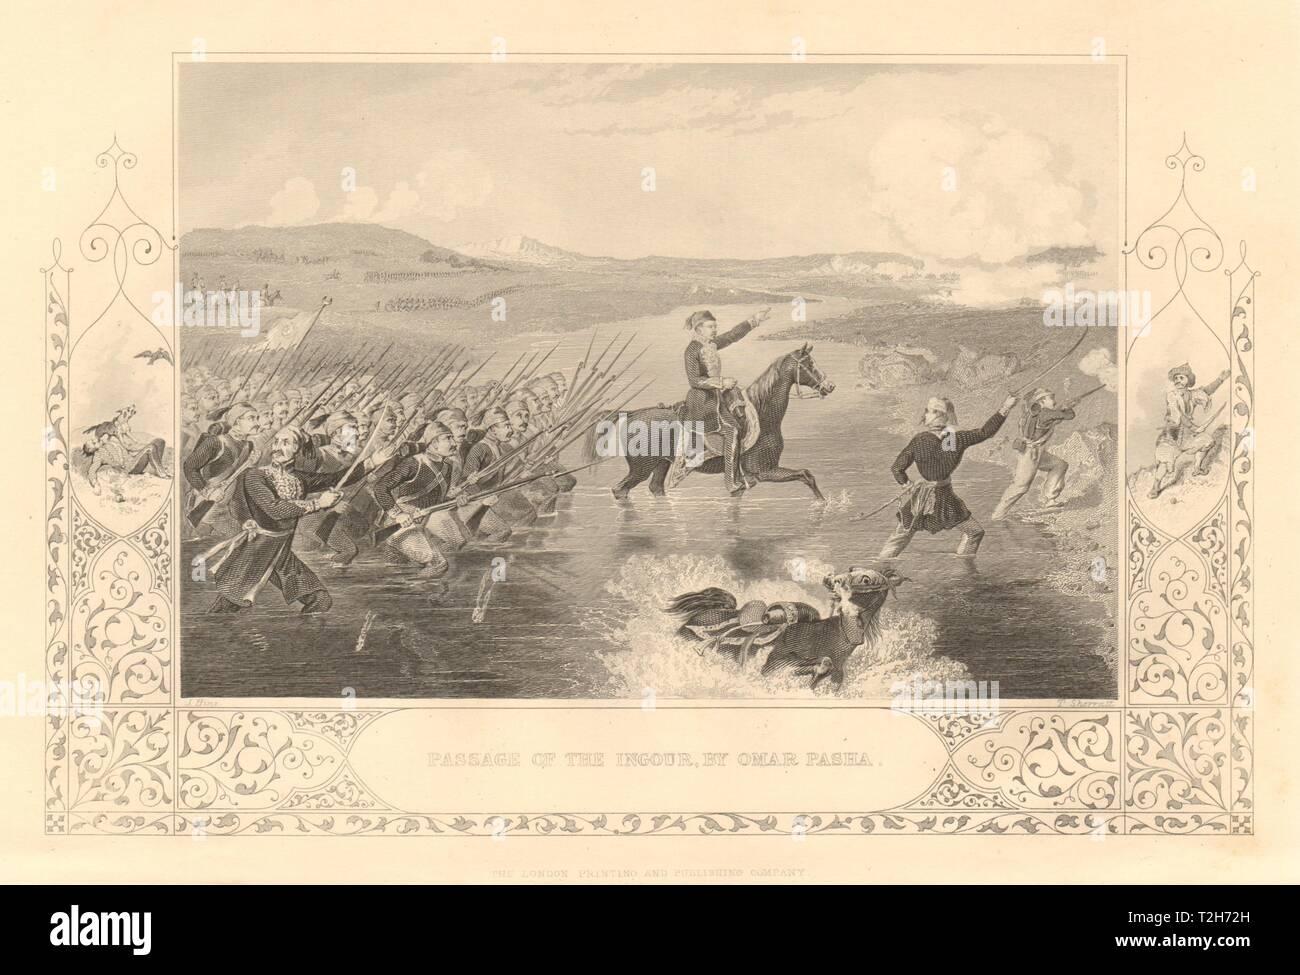 CRIMEAN WAR. Passage of the Ingour (Inguri) river by Omar Pasha. Georgia 1860 - Stock Image